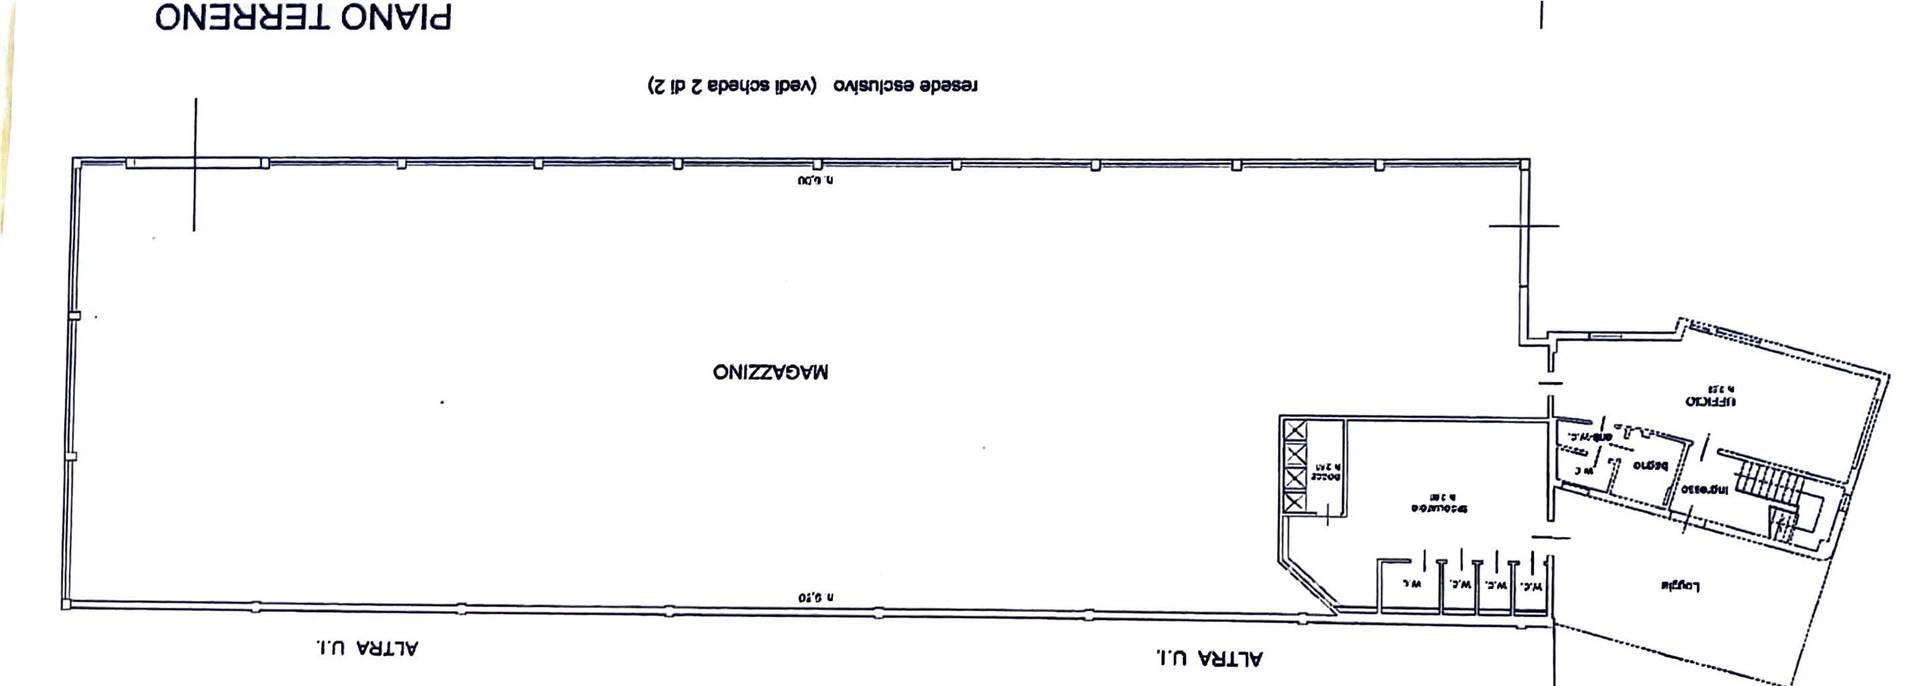 Planimetria Generale Piano terra